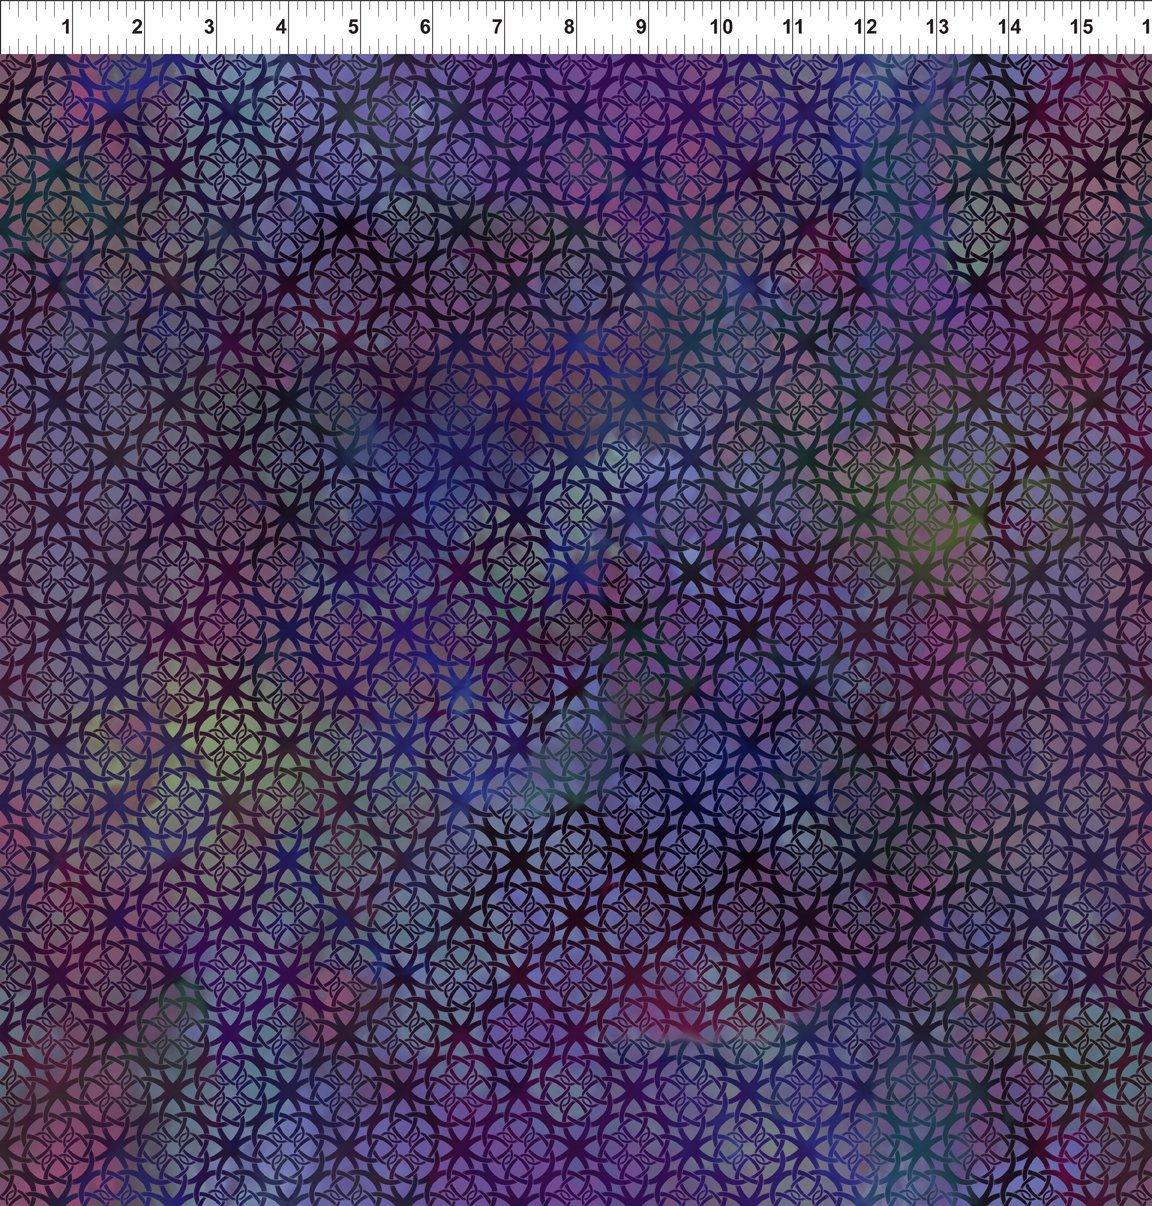 7ENC-4 Mulberry Trellis Diaphanous